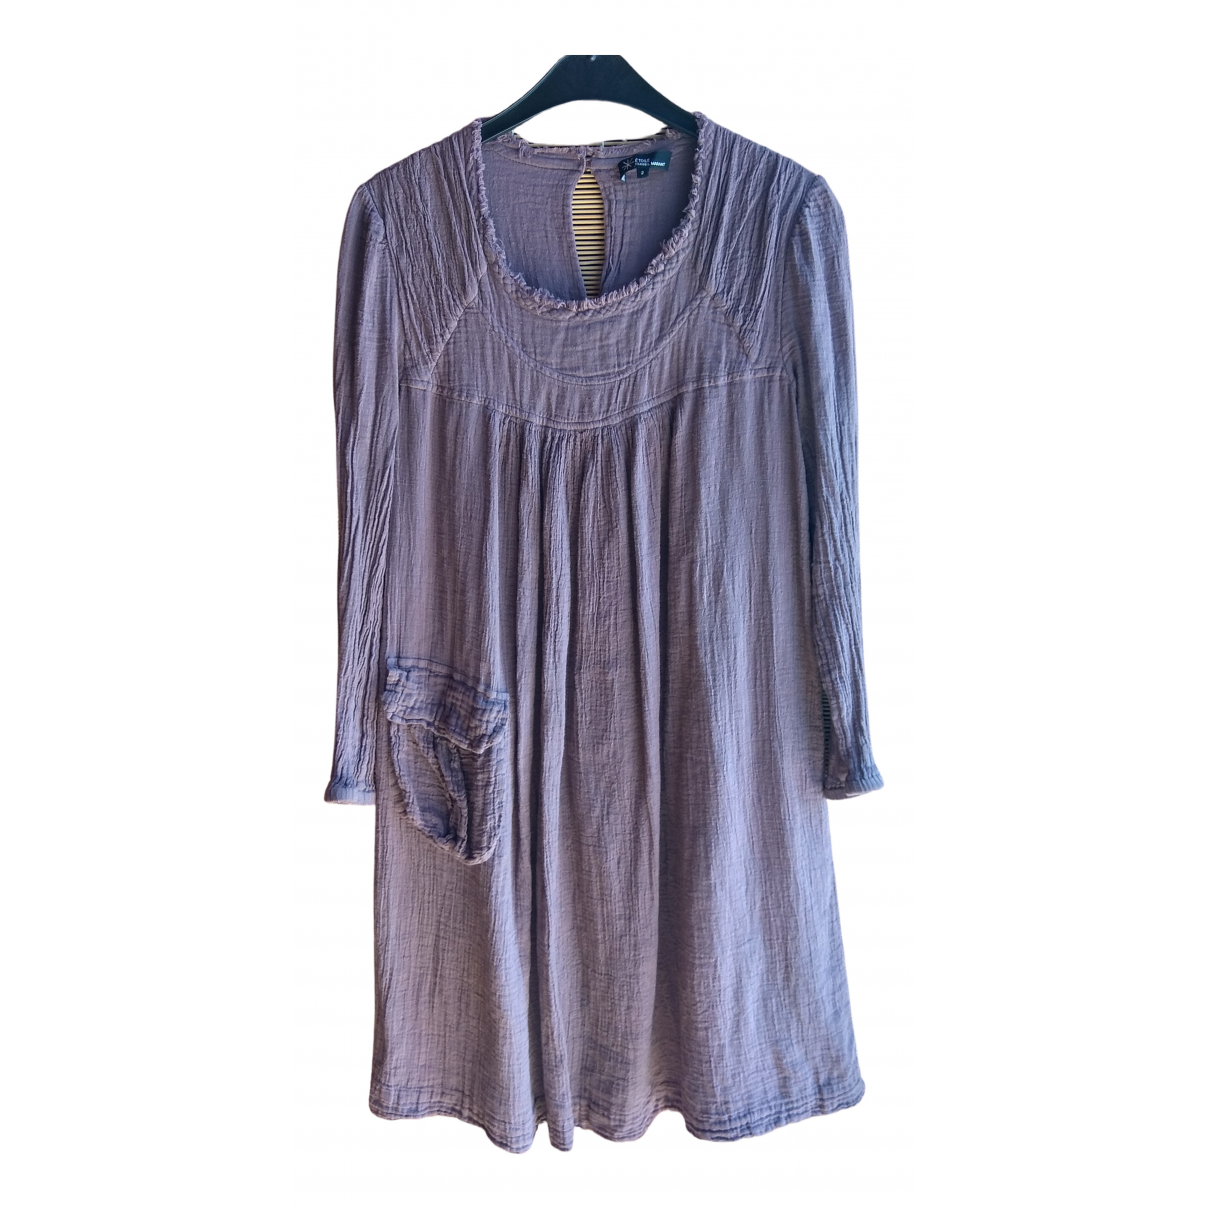 Isabel Marant Etoile \N Purple Cotton dress for Women 2 0-5